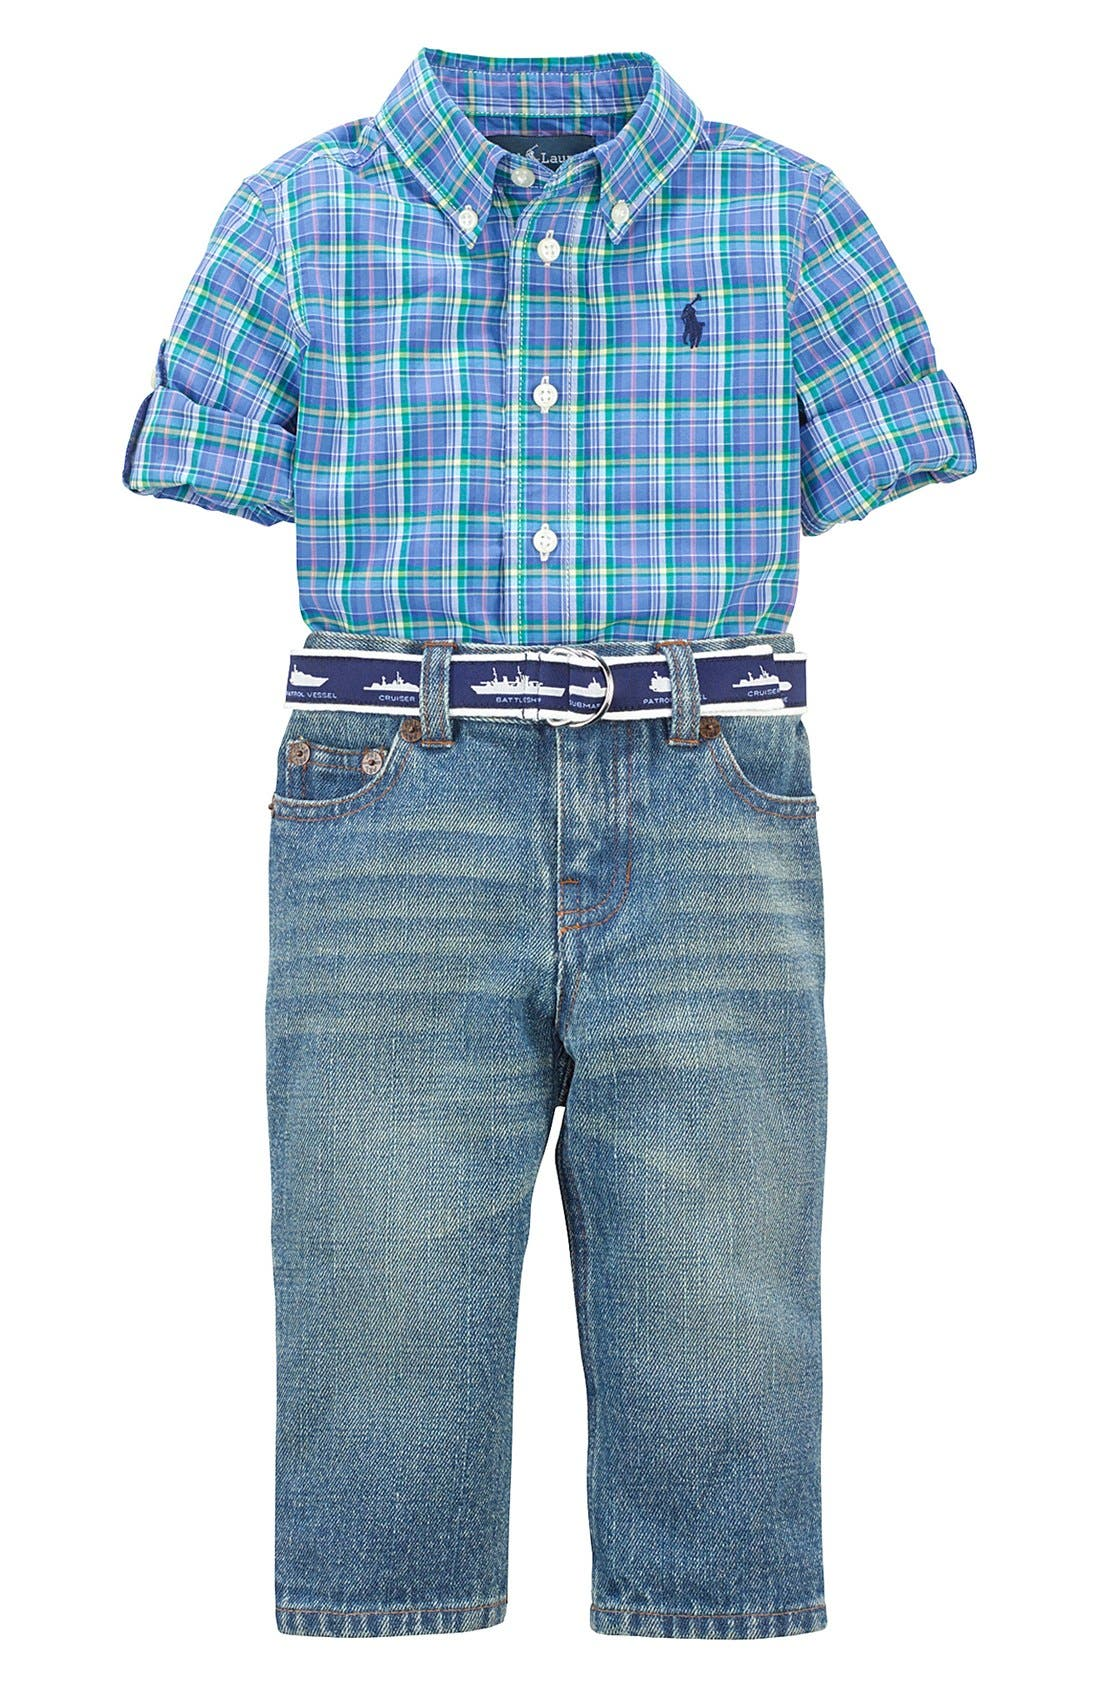 Main Image - Ralph Lauren Plaid Sport Shirt & Jeans (Baby Boys)